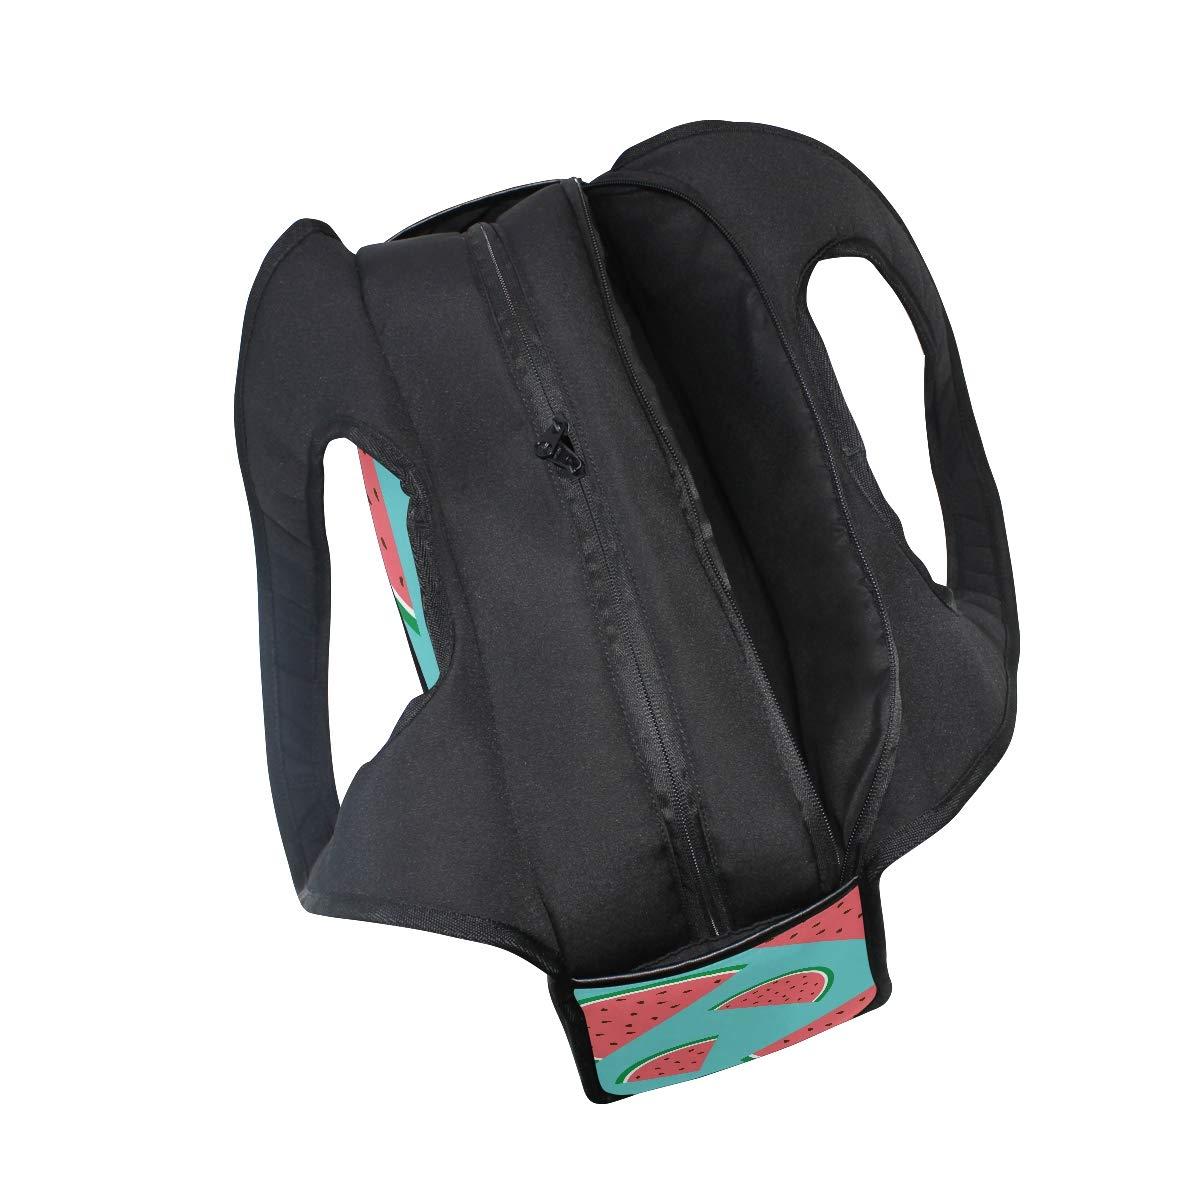 Watermelon Painted Women Sports Gym Totes Bag Multi-Function Nylon Travel Shoulder Bag